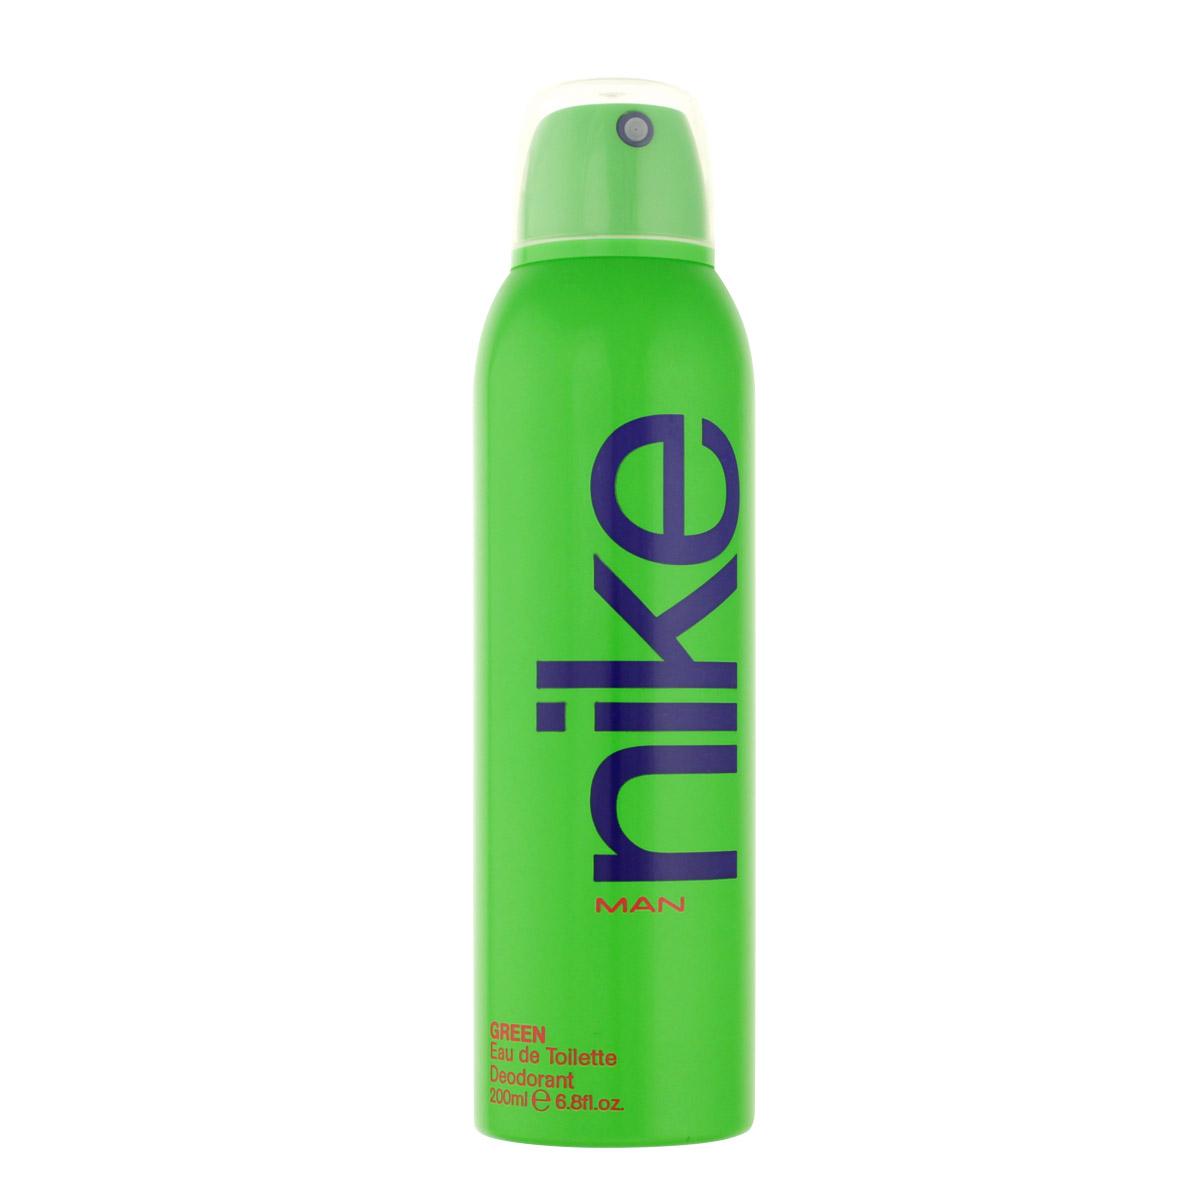 Nike Green Man Deodorant im Spray 200 ml (man) 87813